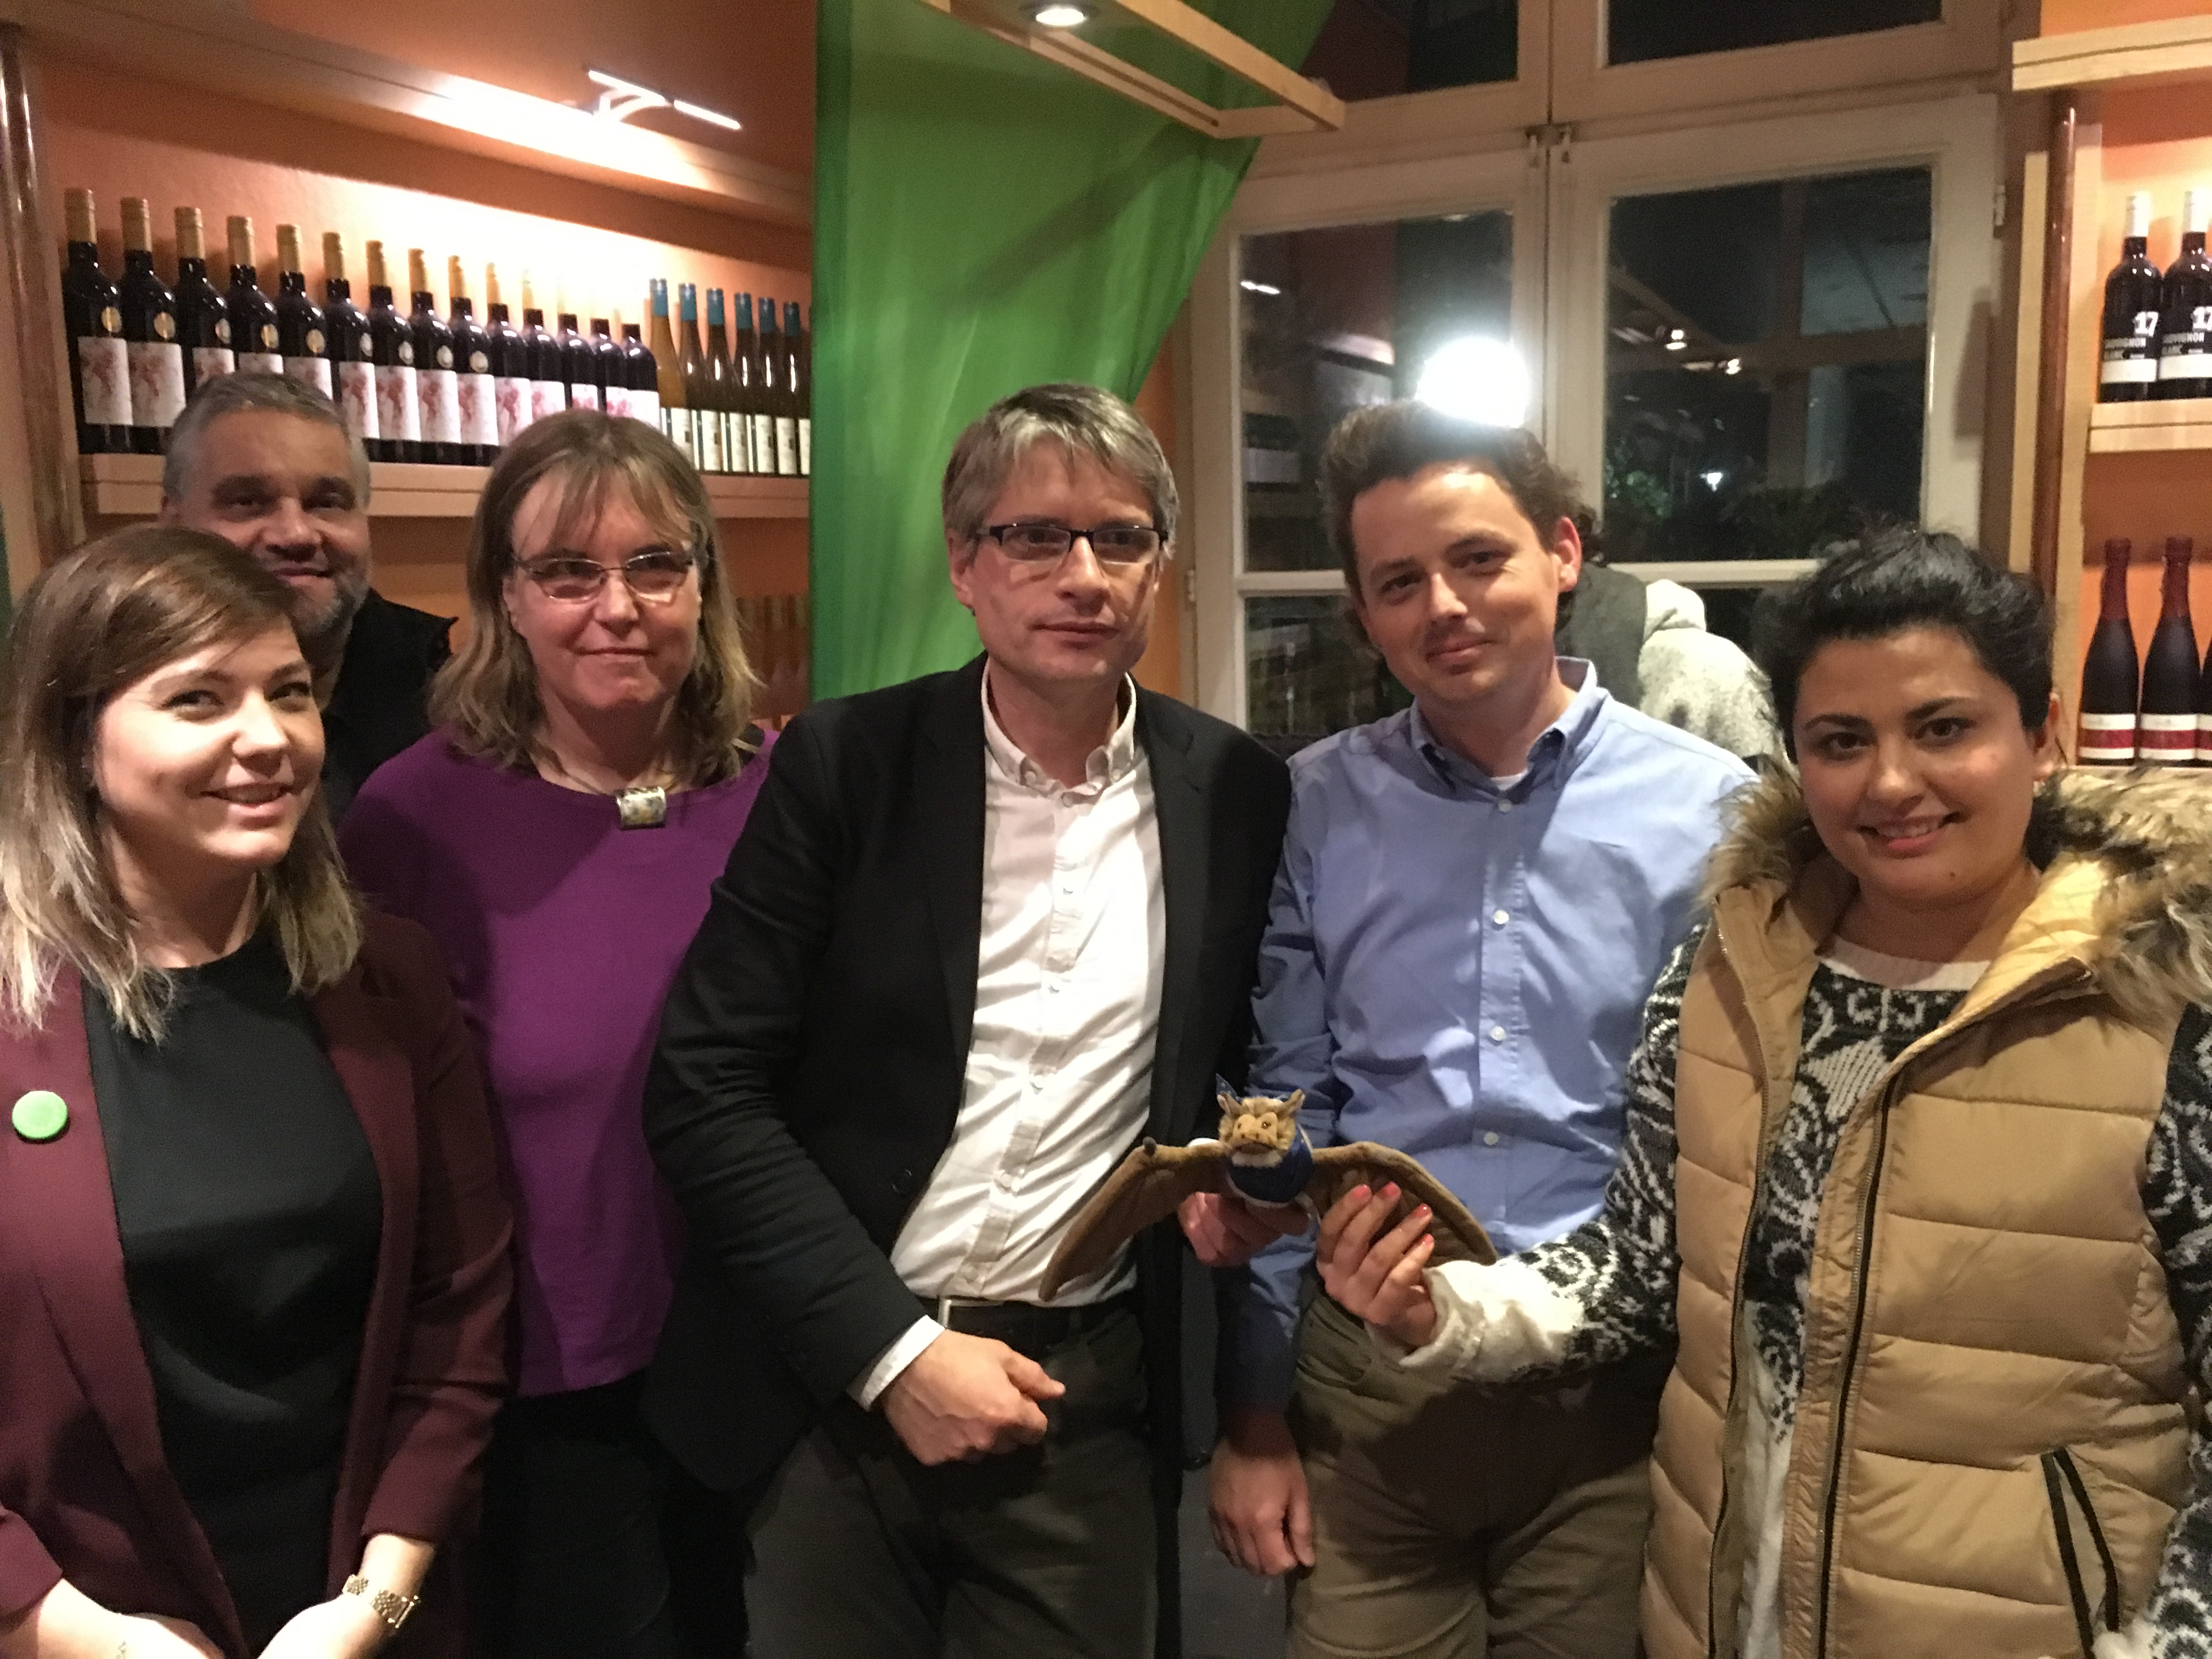 Sven Giegold zu Gast in Neuss: Grüne eröffnen Europawahlkampf